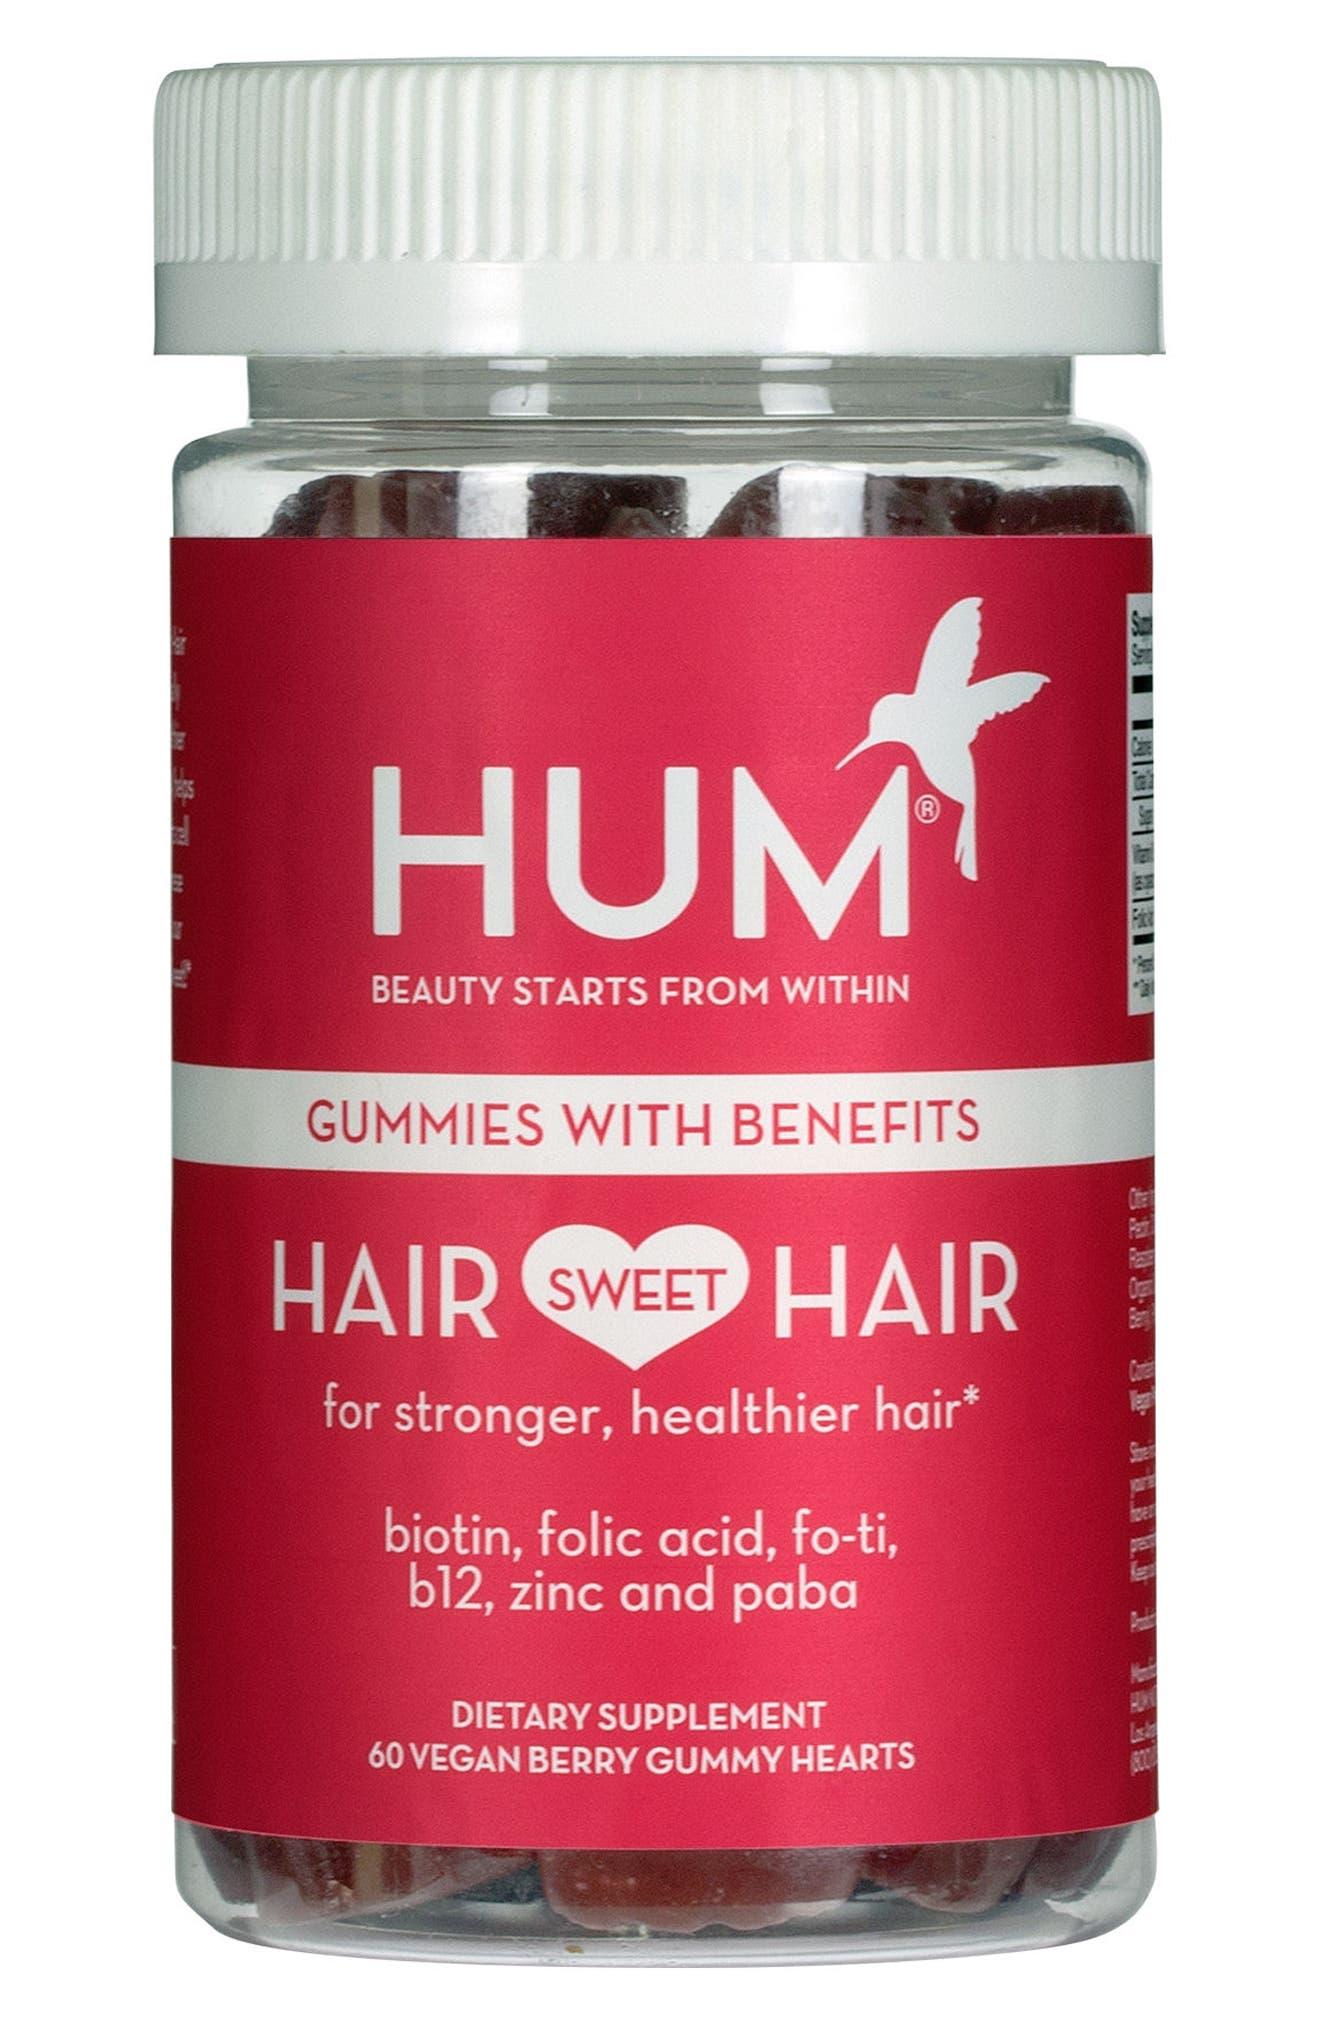 Hair Sweet Hair Gummies Supplement for Healthy Hair,                             Main thumbnail 1, color,                             NO COLOR